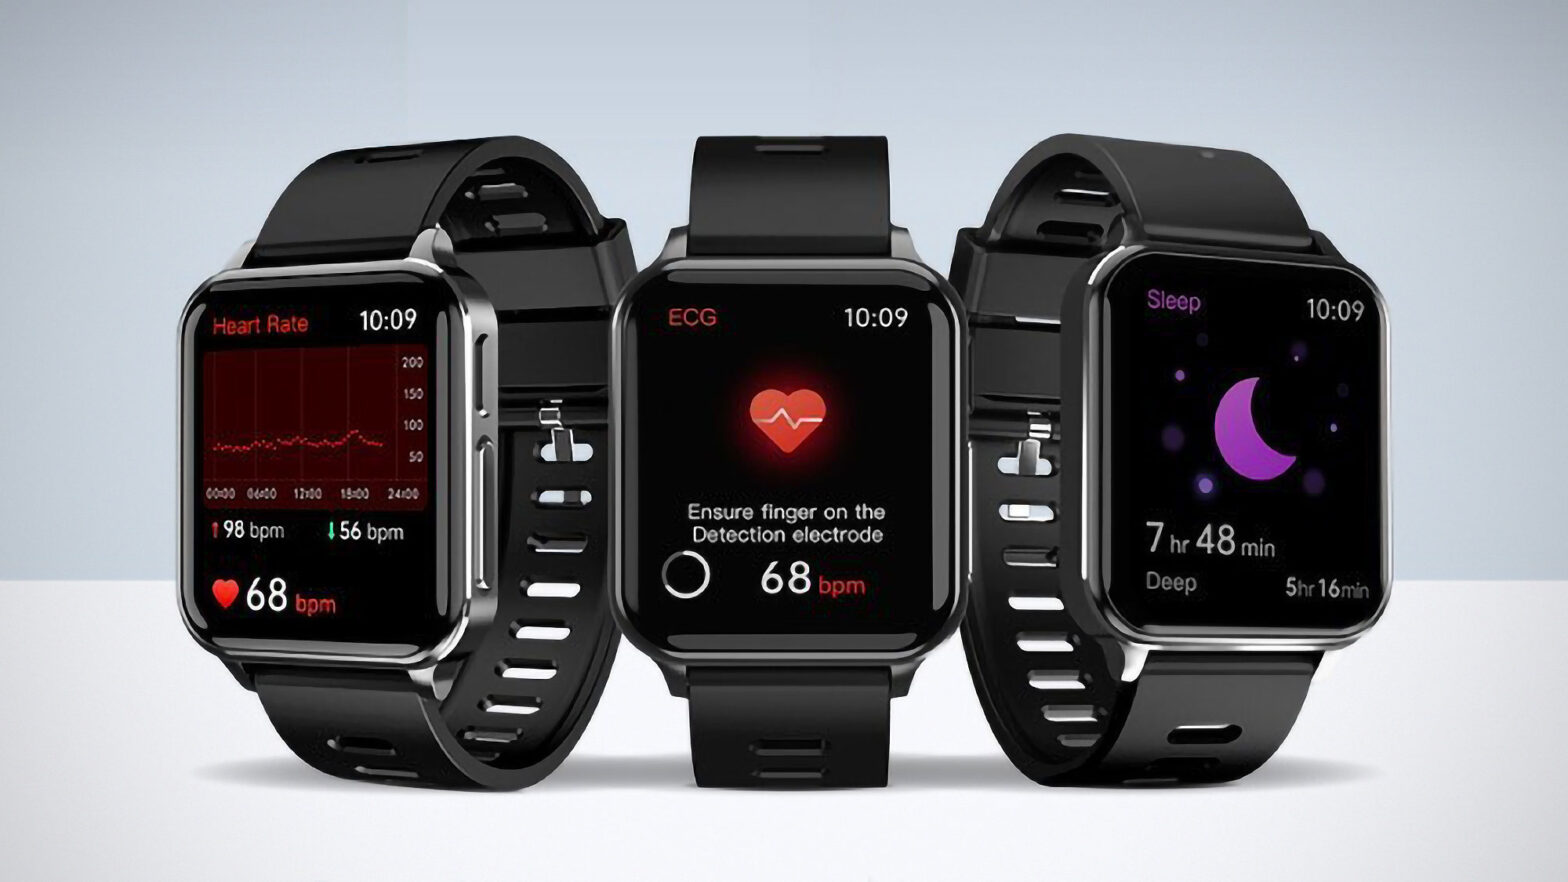 Veepoo Watch Rig Healthcare Smartwatch